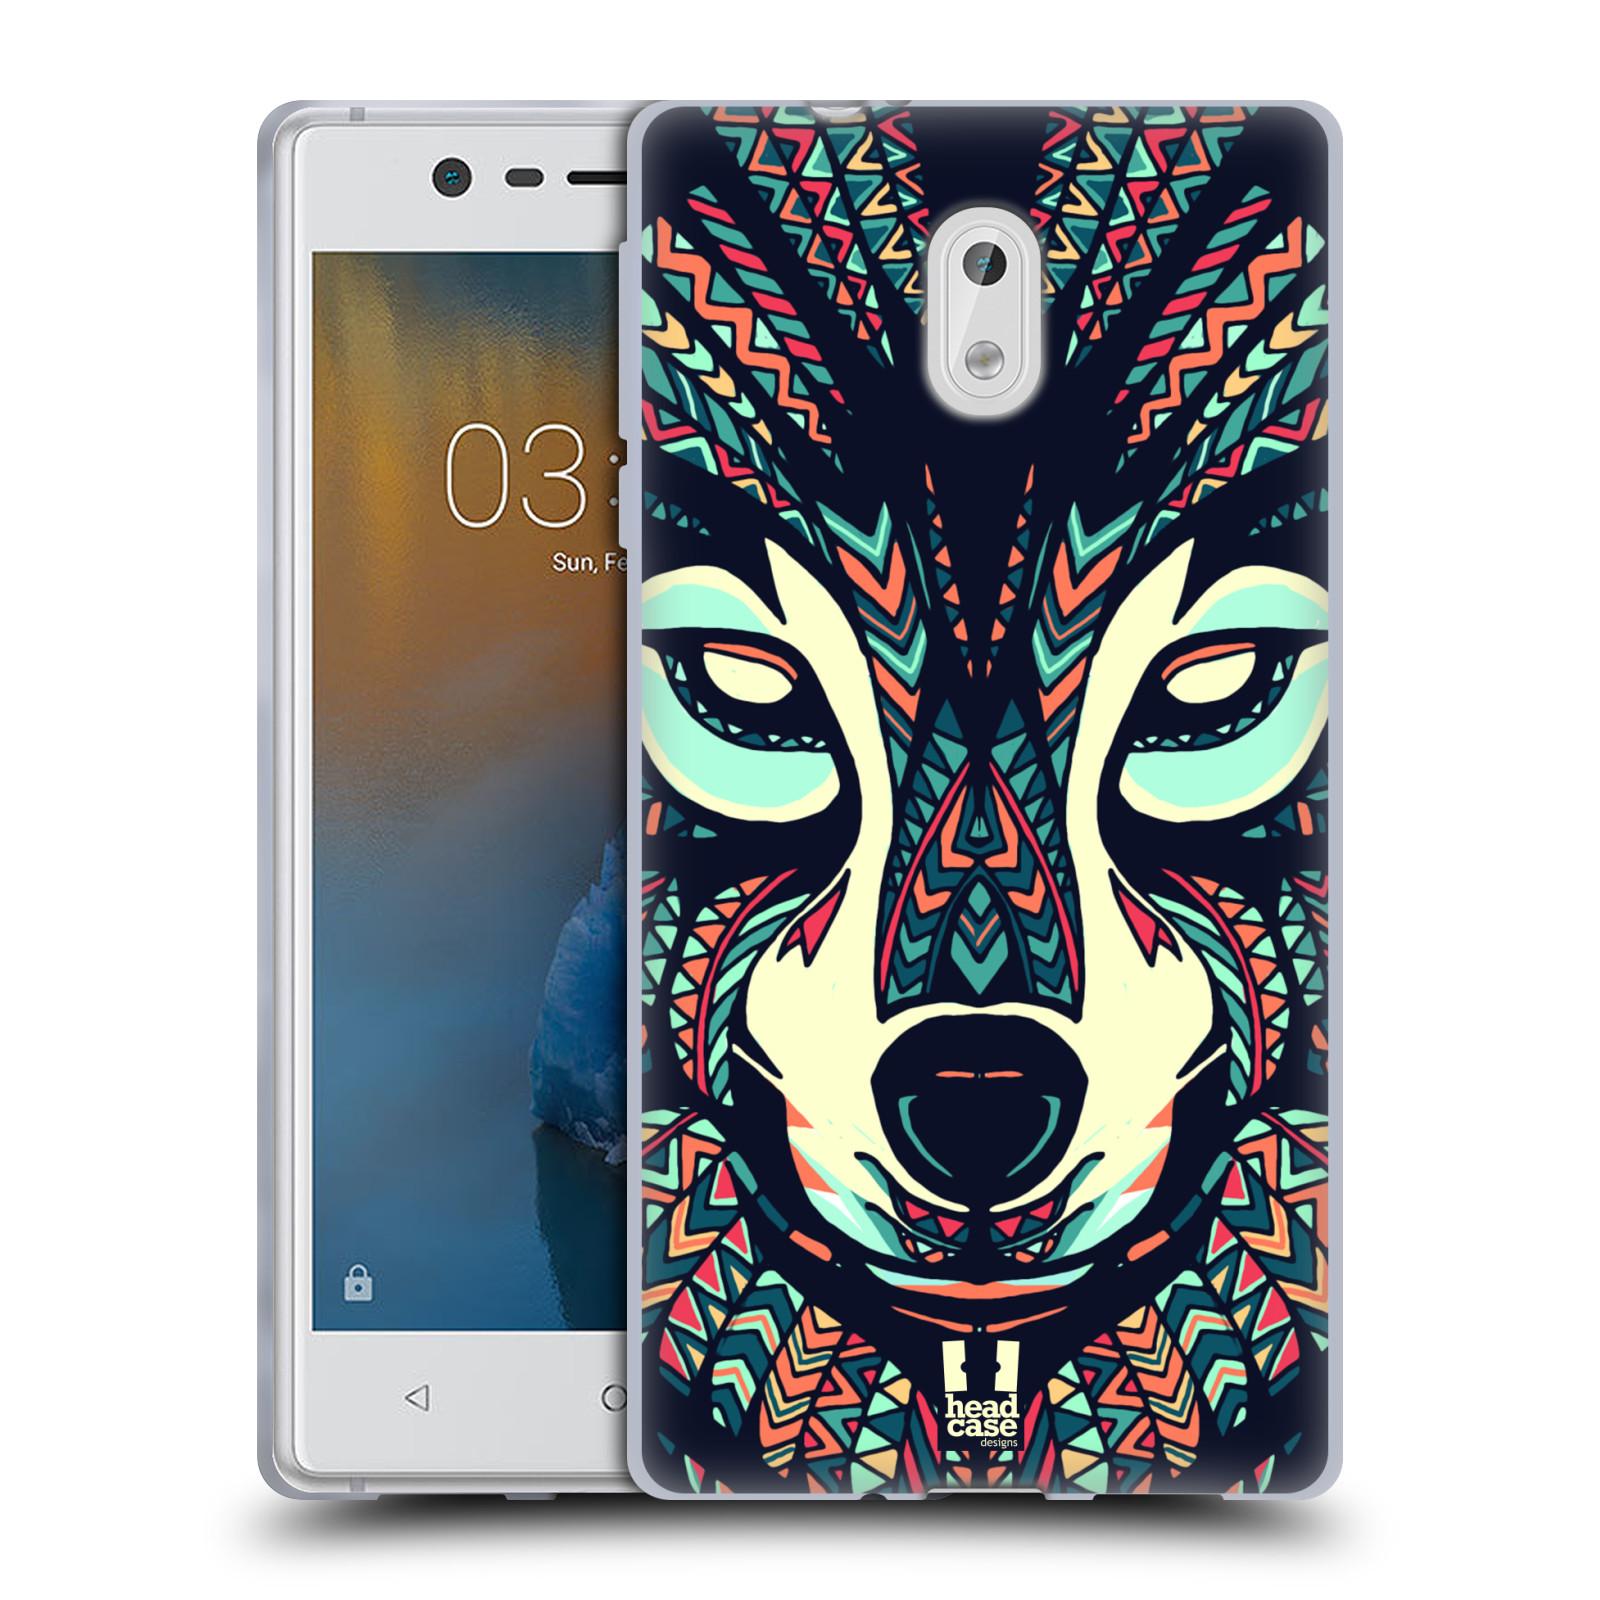 Silikonové pouzdro na mobil Nokia 3 Head Case - AZTEC VLK